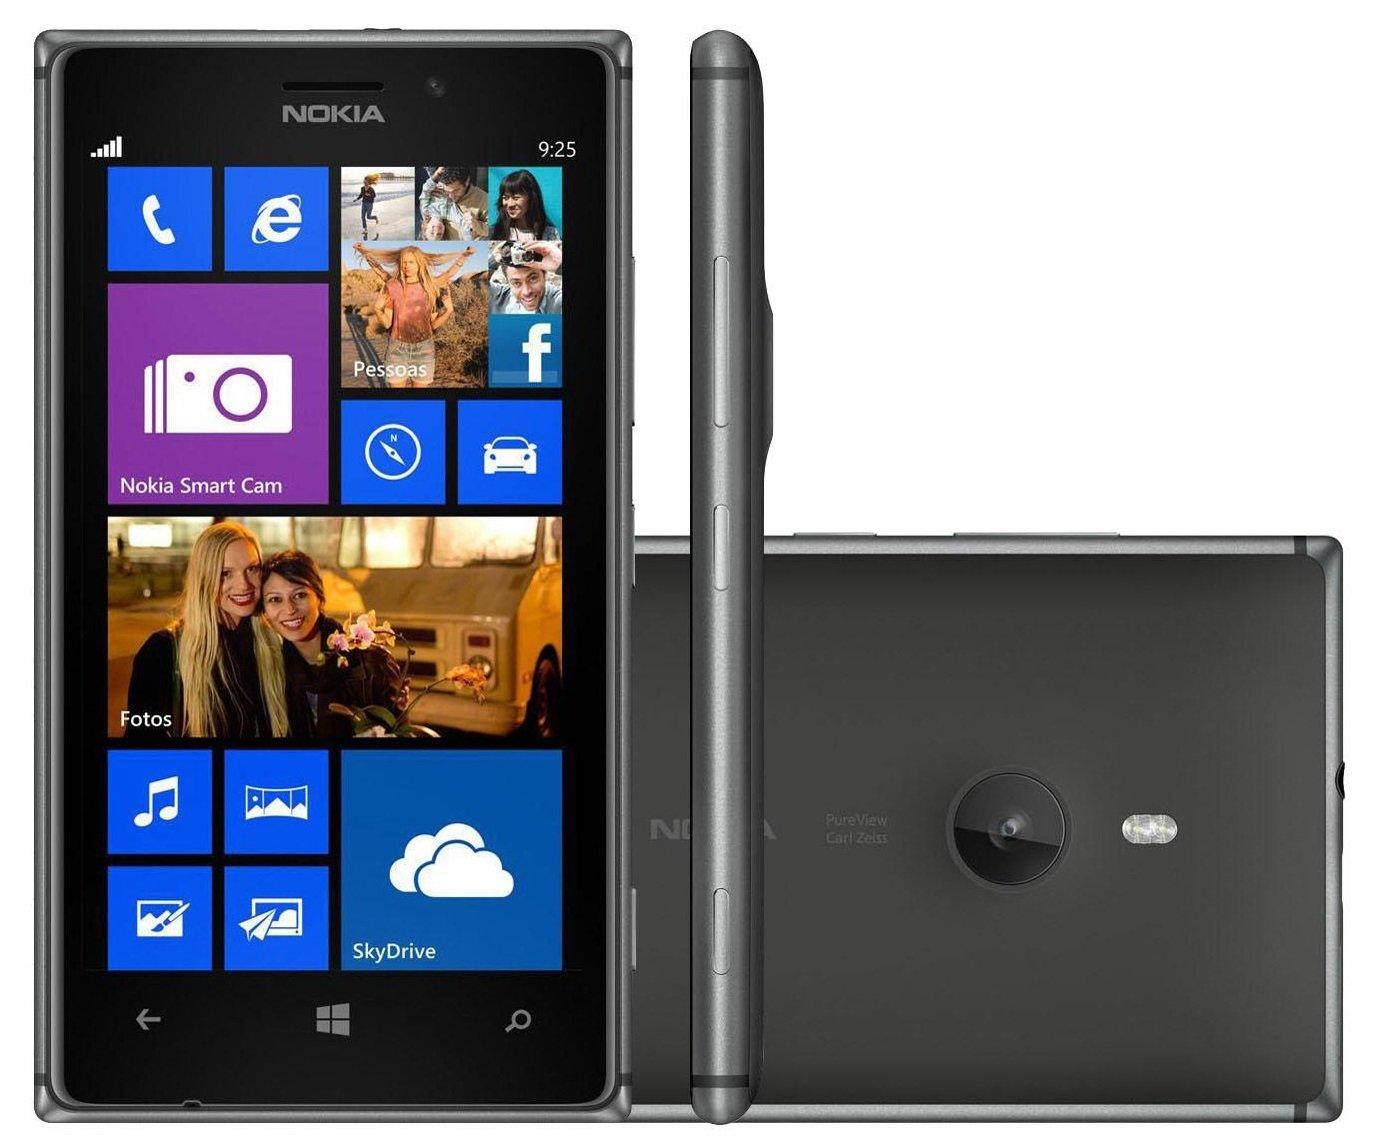 Verizon windows phones coming soon 2016 - Amazon Com Nokia Lumia 925 16gb Unlocked Gsm 4g Lte Windows 8 Smartphone W 8mp Camera Black At T No Warranty Cell Phones Accessories